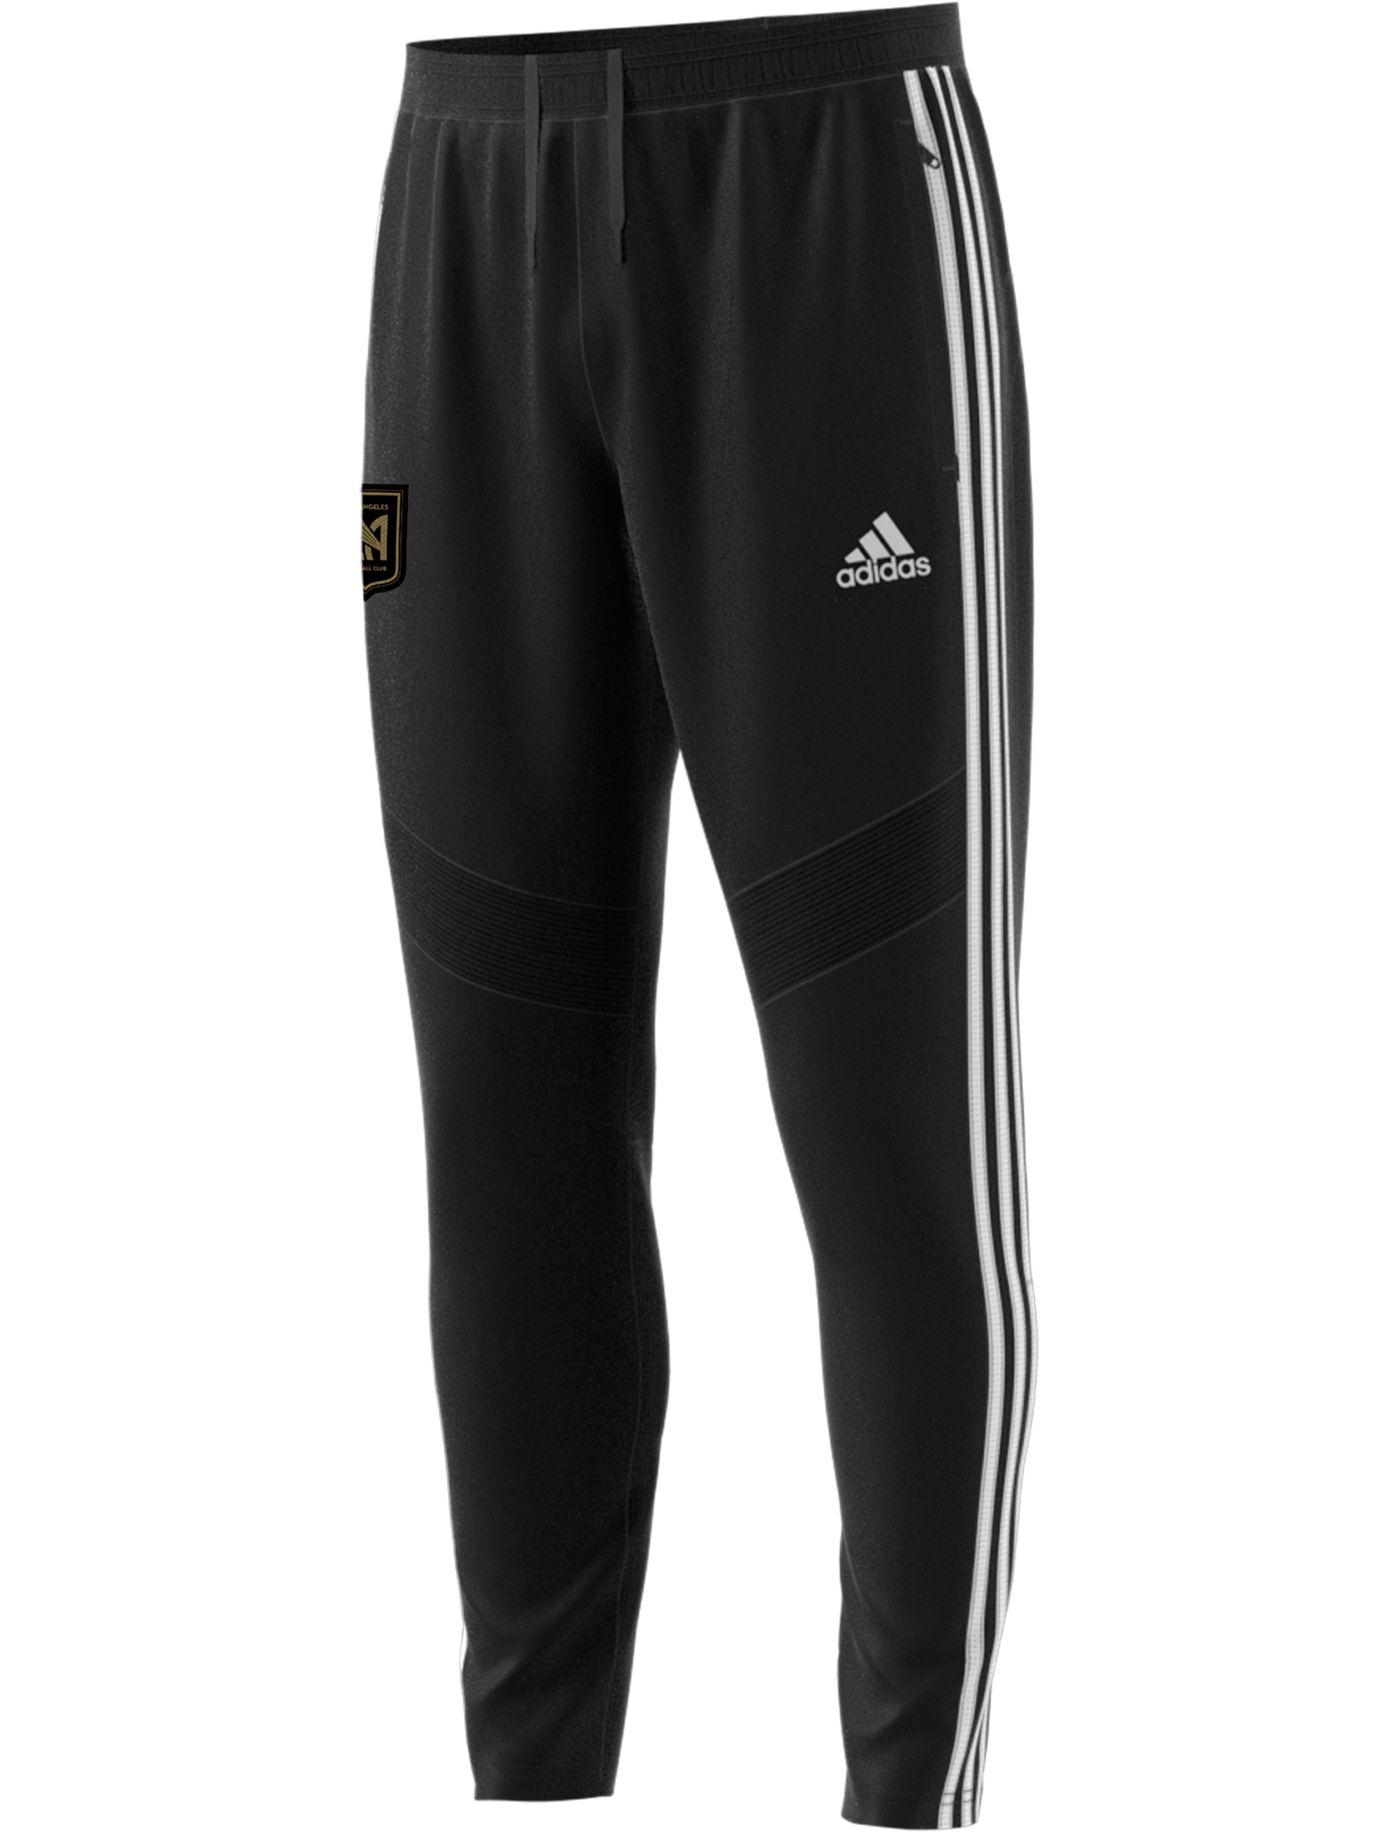 adidas Men's Los Angeles FC Tiro Black Pants